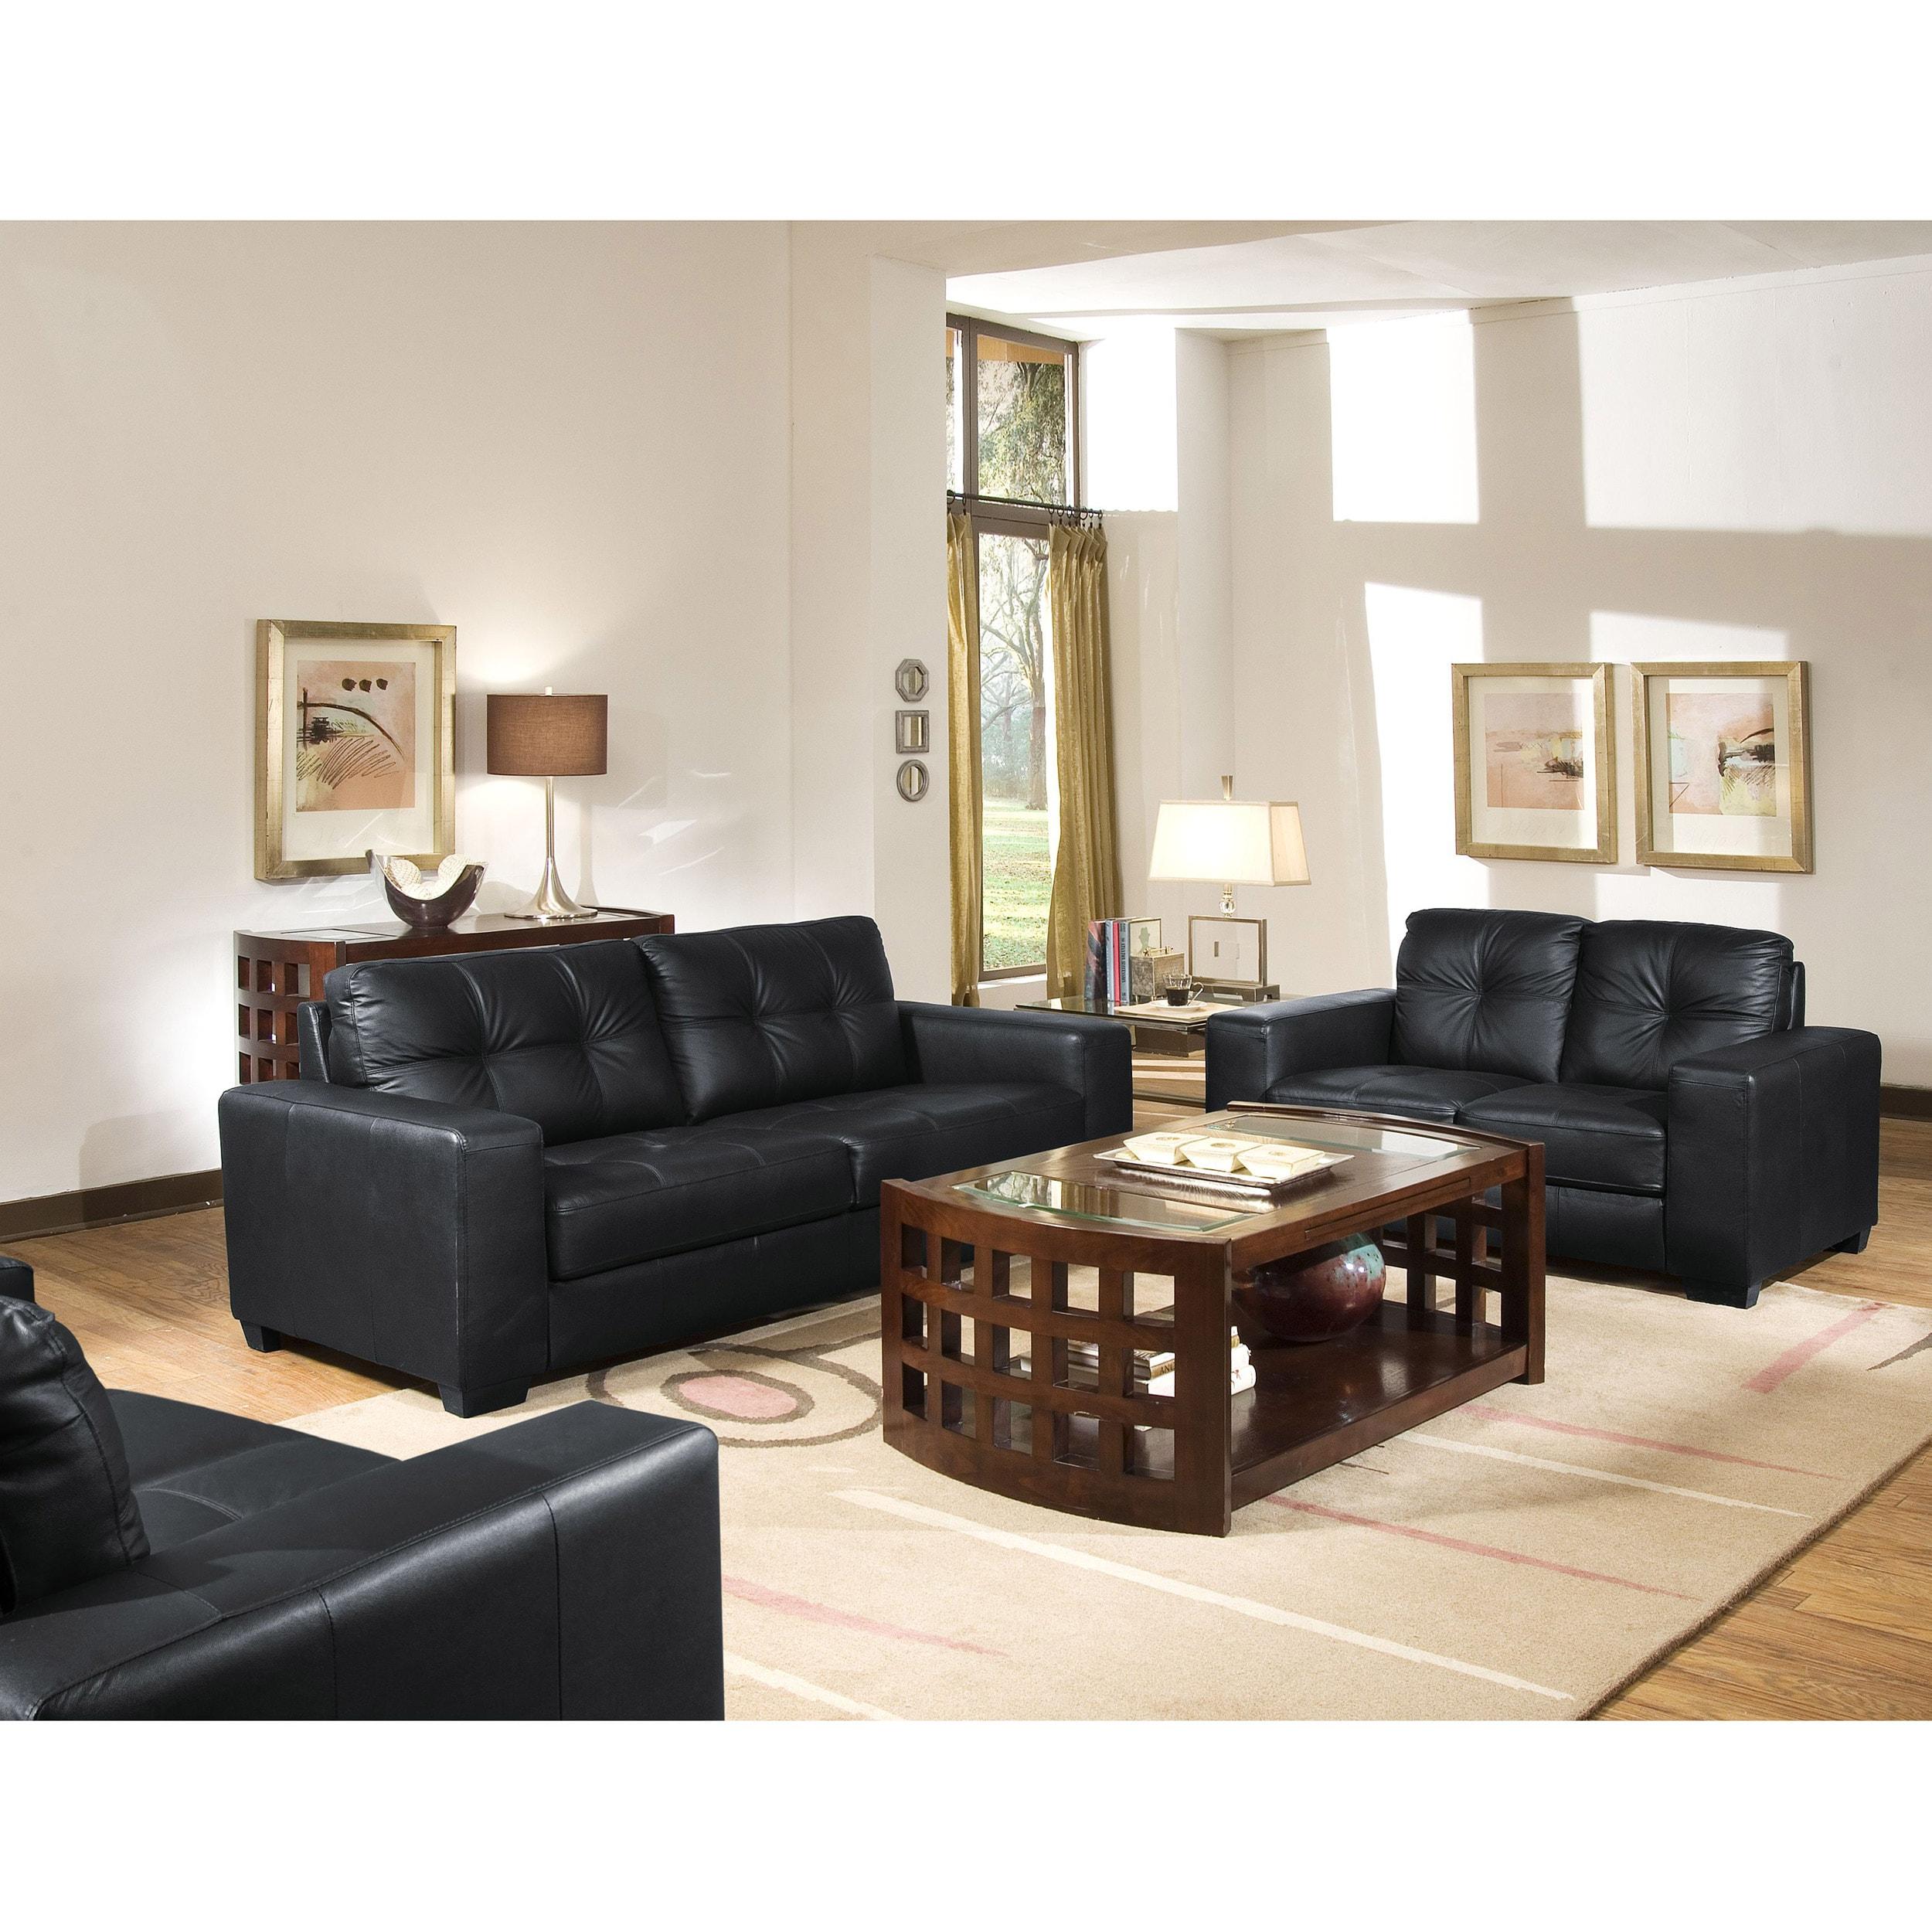 Living Room Modern Black: Modern Black Leather Upholstery Living Room Lounge Couch